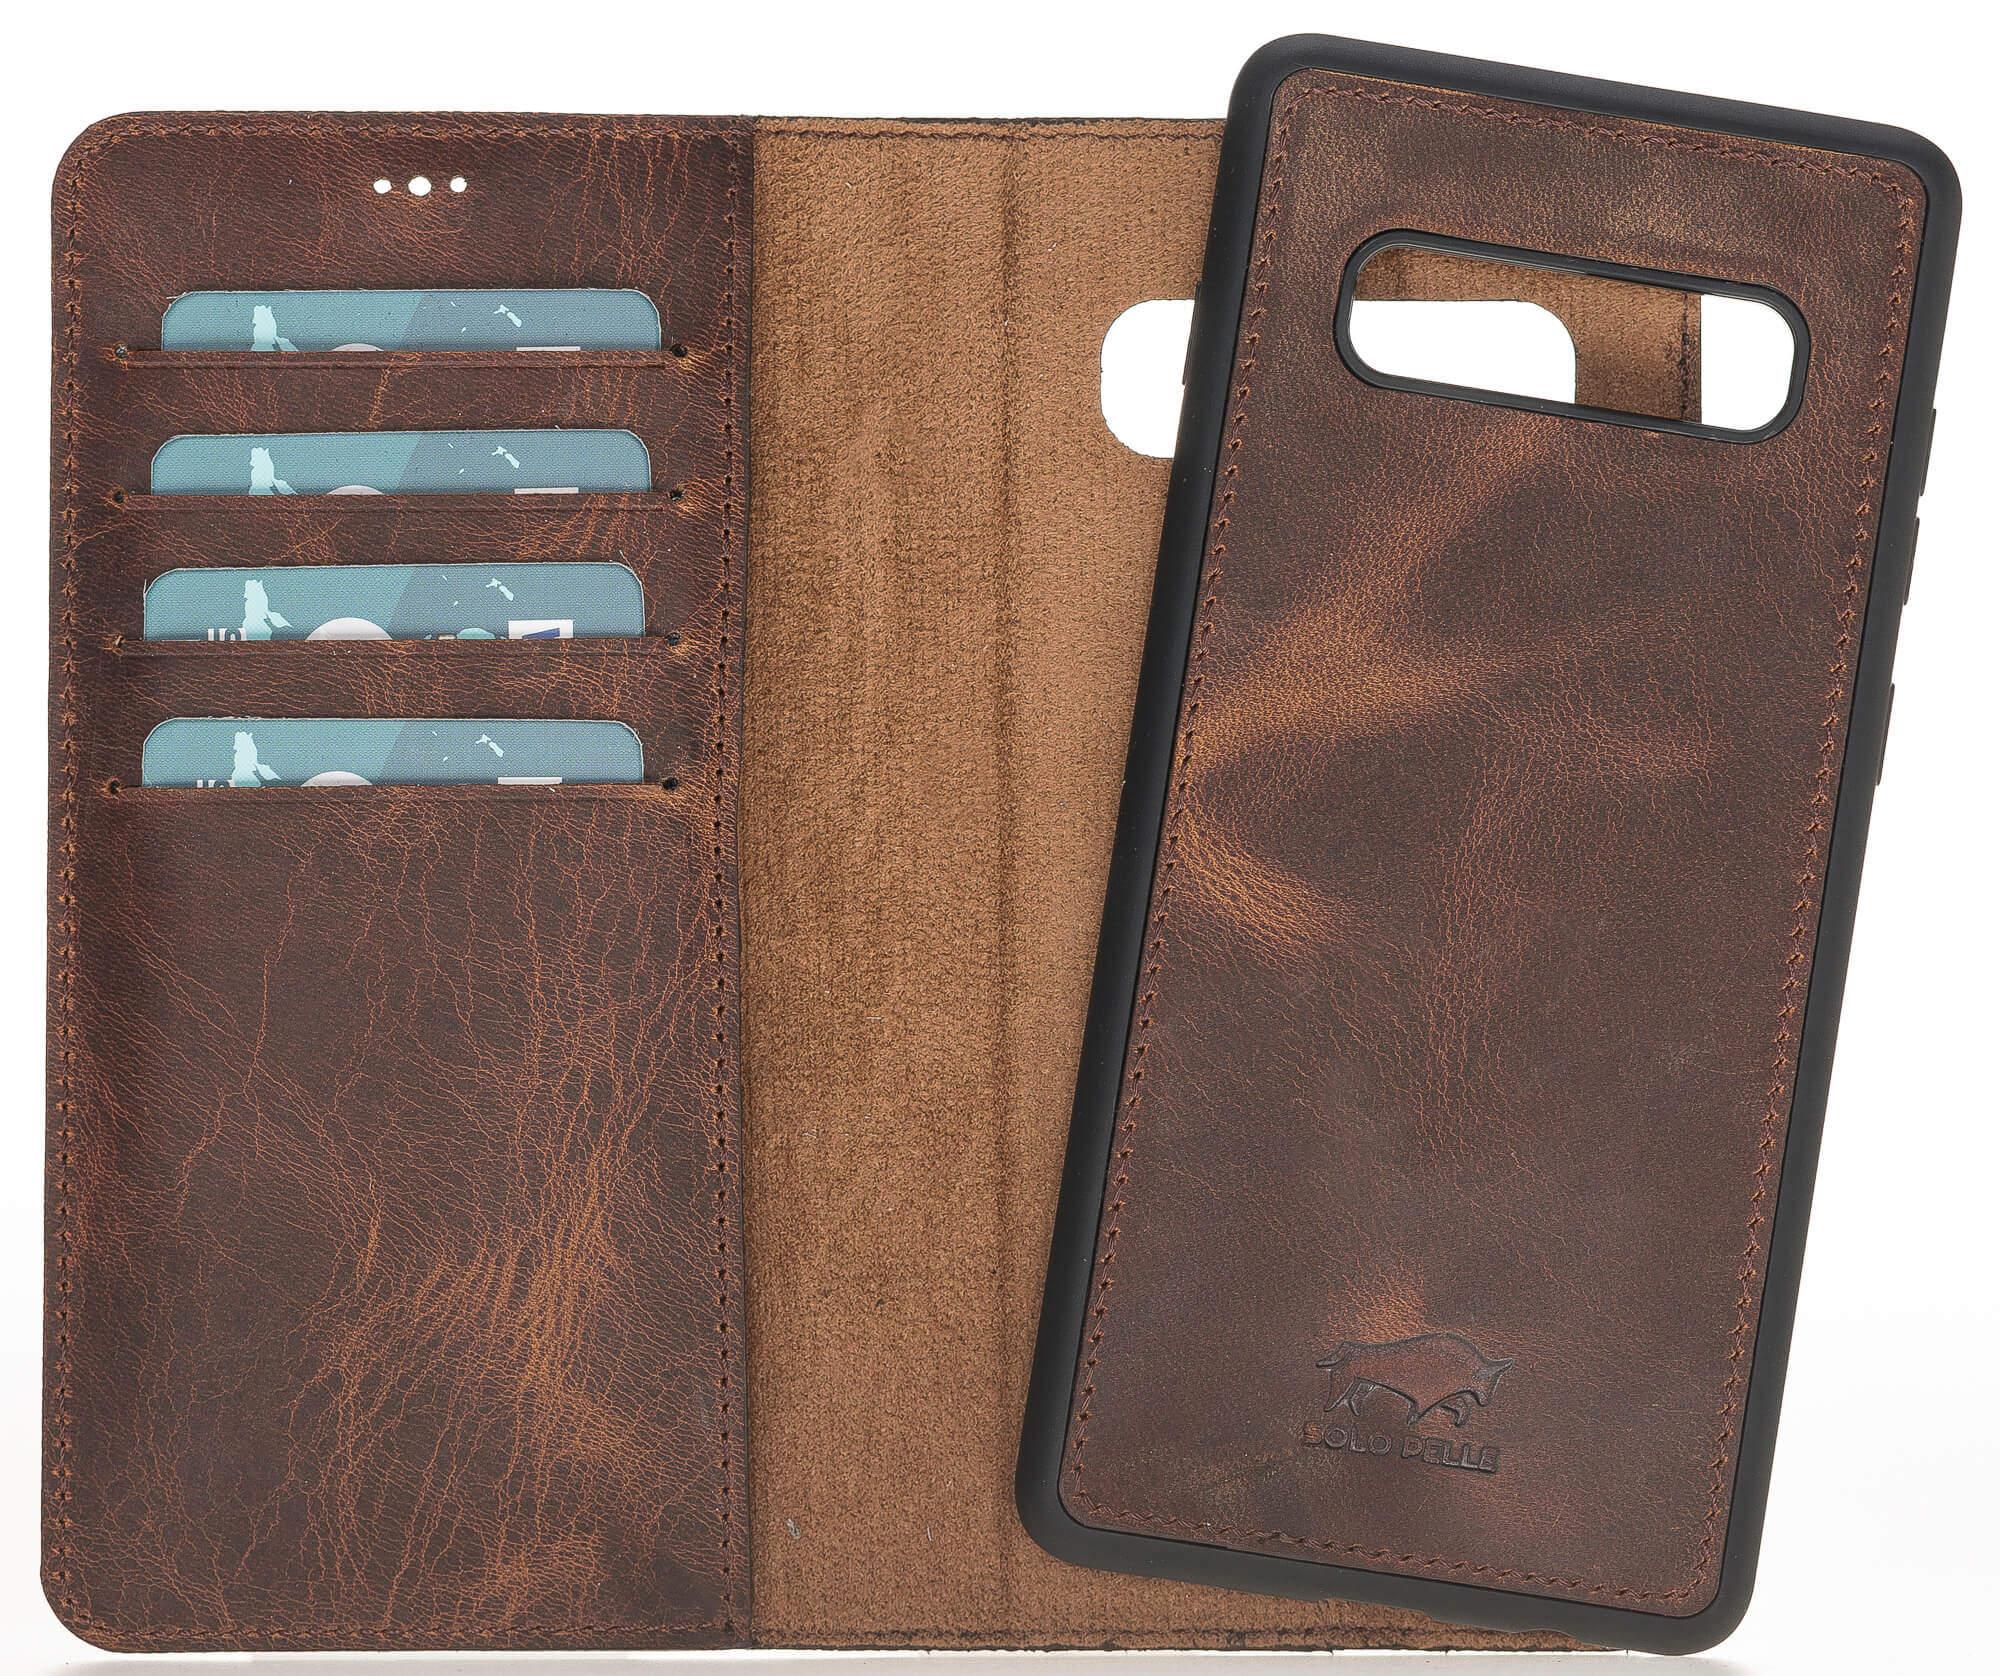 "Samsung S10+ abnehmbare Lederhülle ""Harvard"" Leder Hülle Tasche Lederhülle Ledertasche  in Vintage Braun"